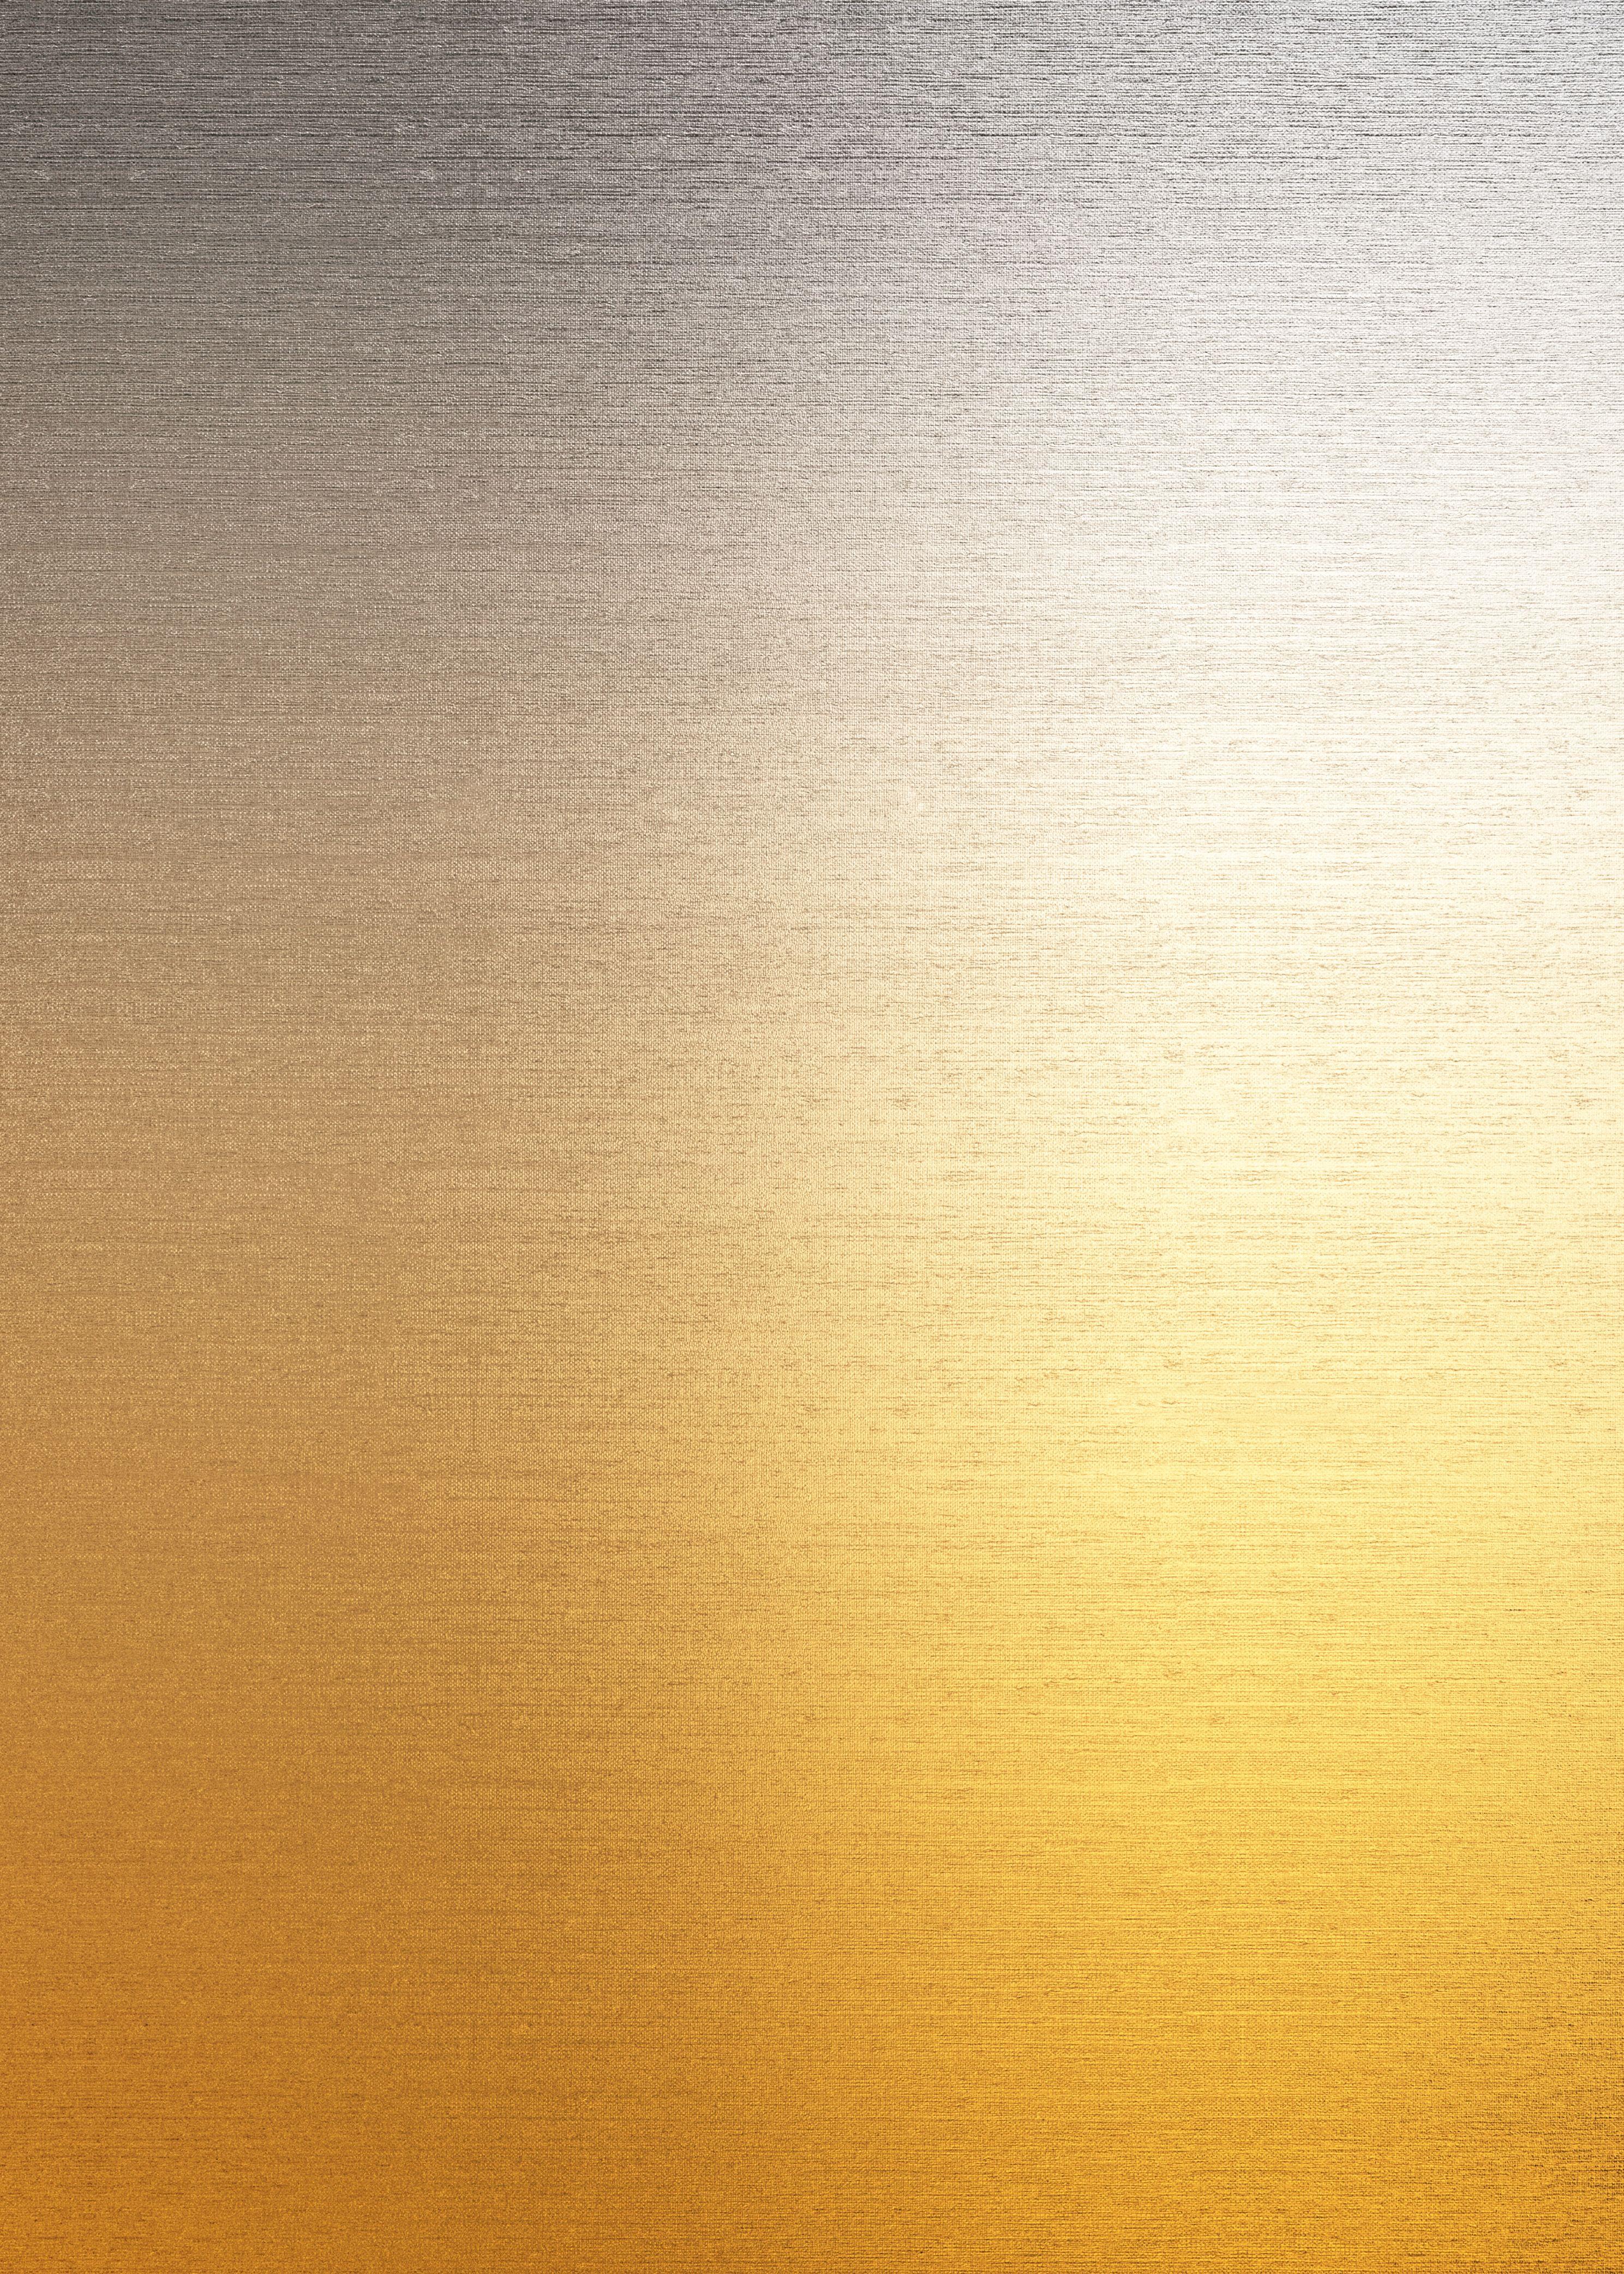 Calico Wallpaper - Brasscloth Mica